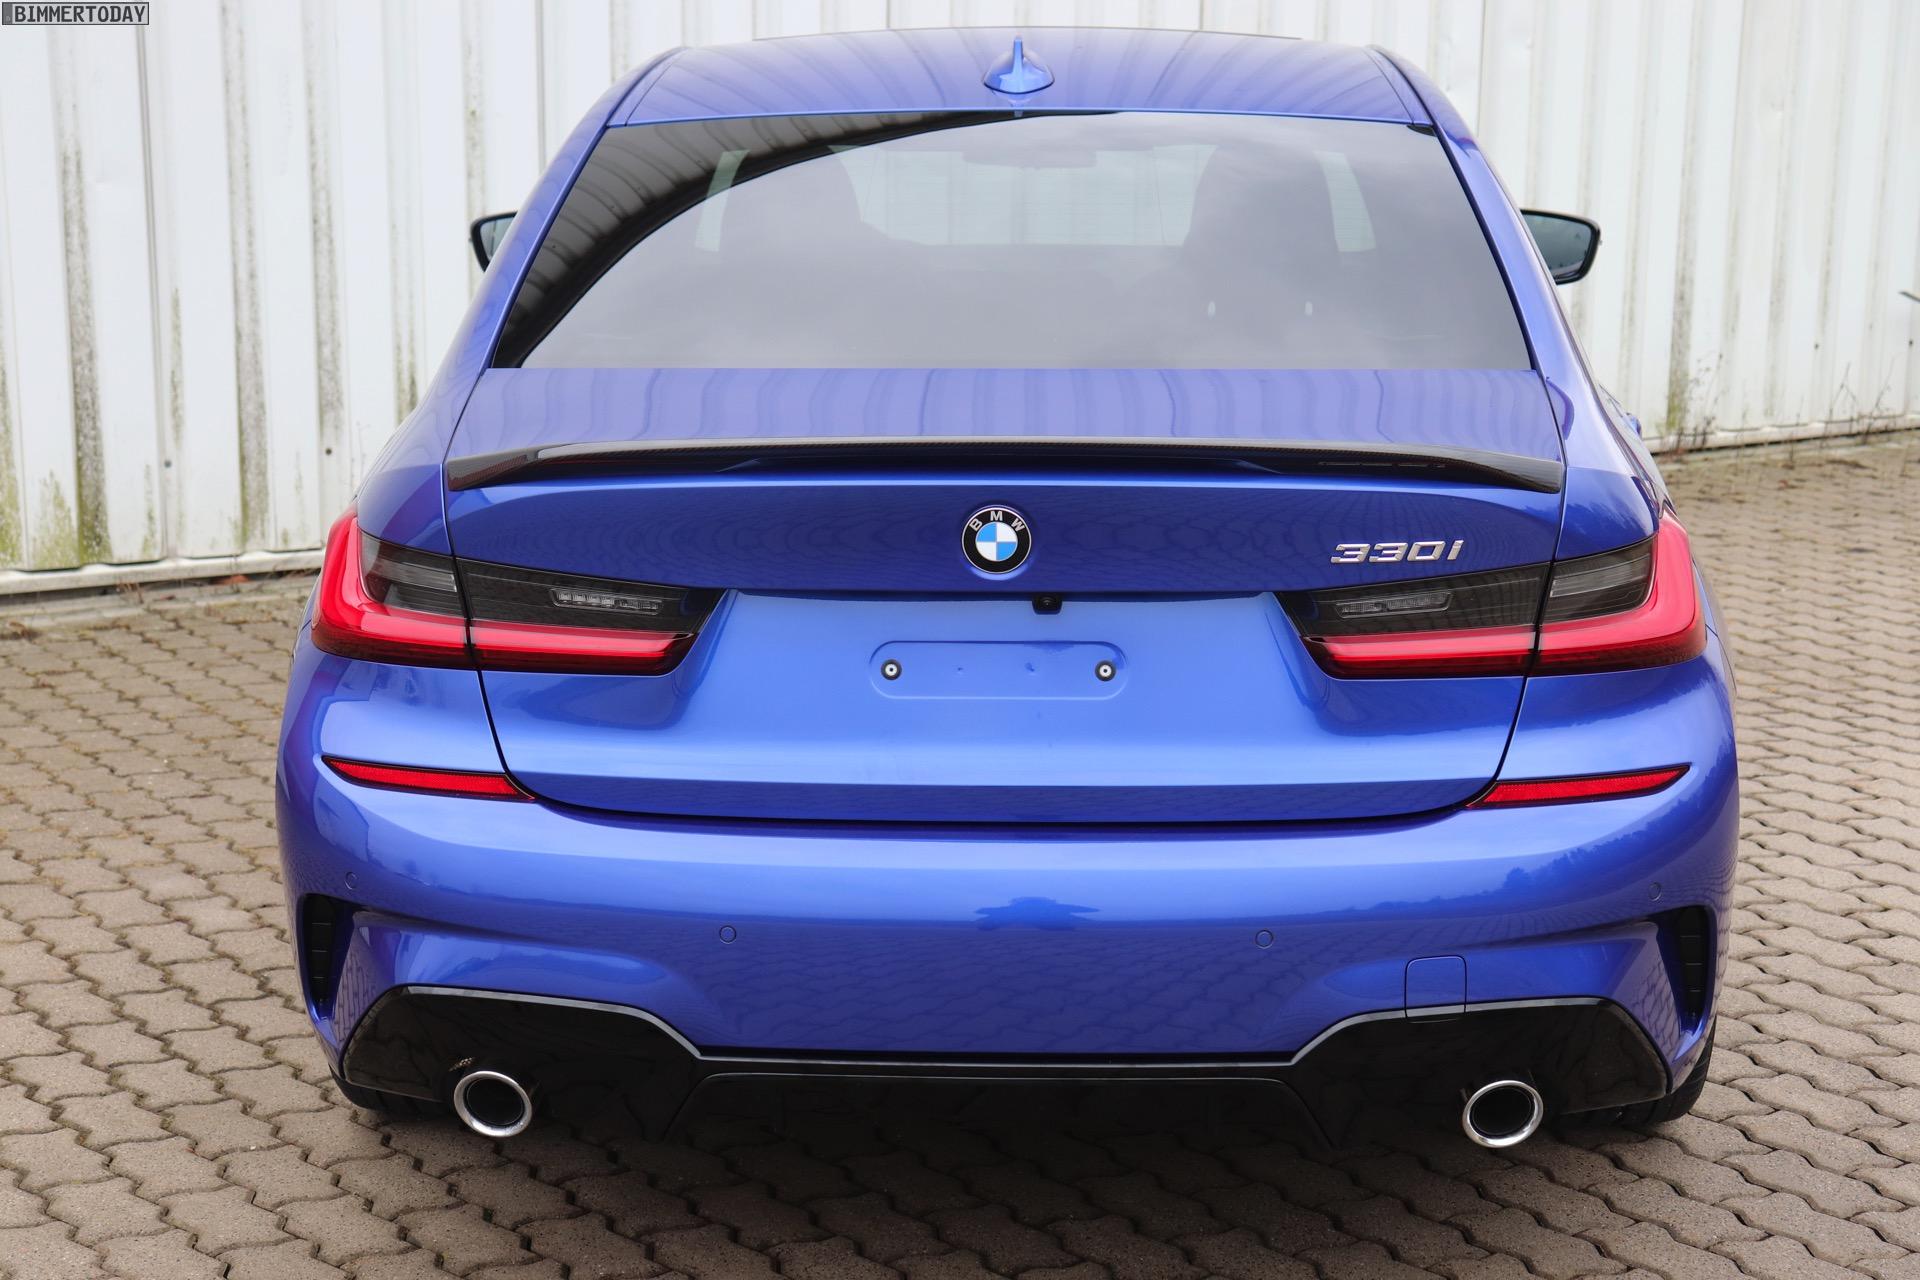 Name:  2019-BMW-330i-G20-M-Performance-Parts-1.jpg2019-BMW-330i-G20-M-Performance-Parts-1.jpg2019-BMW-3.jpg Views: 1889 Size:  455.8 KB